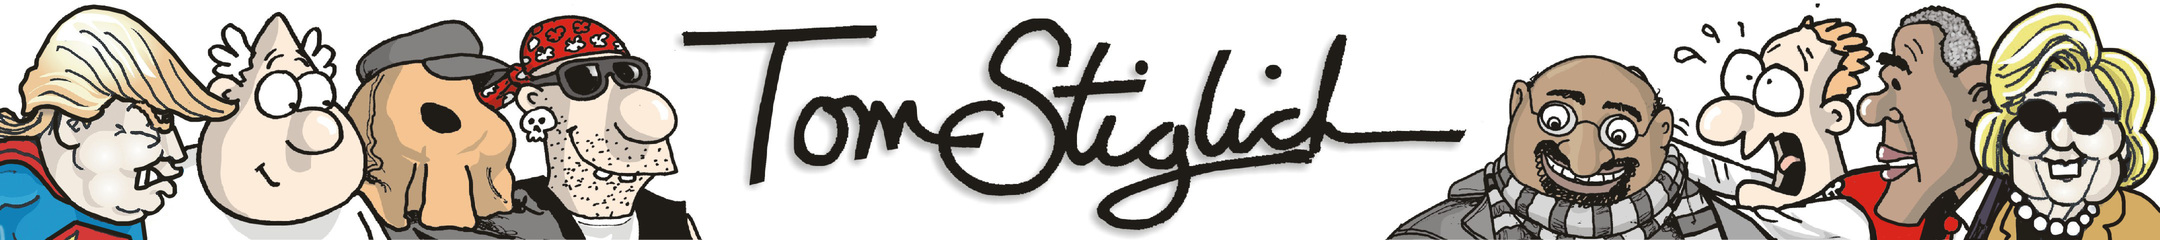 Tom Stiglich